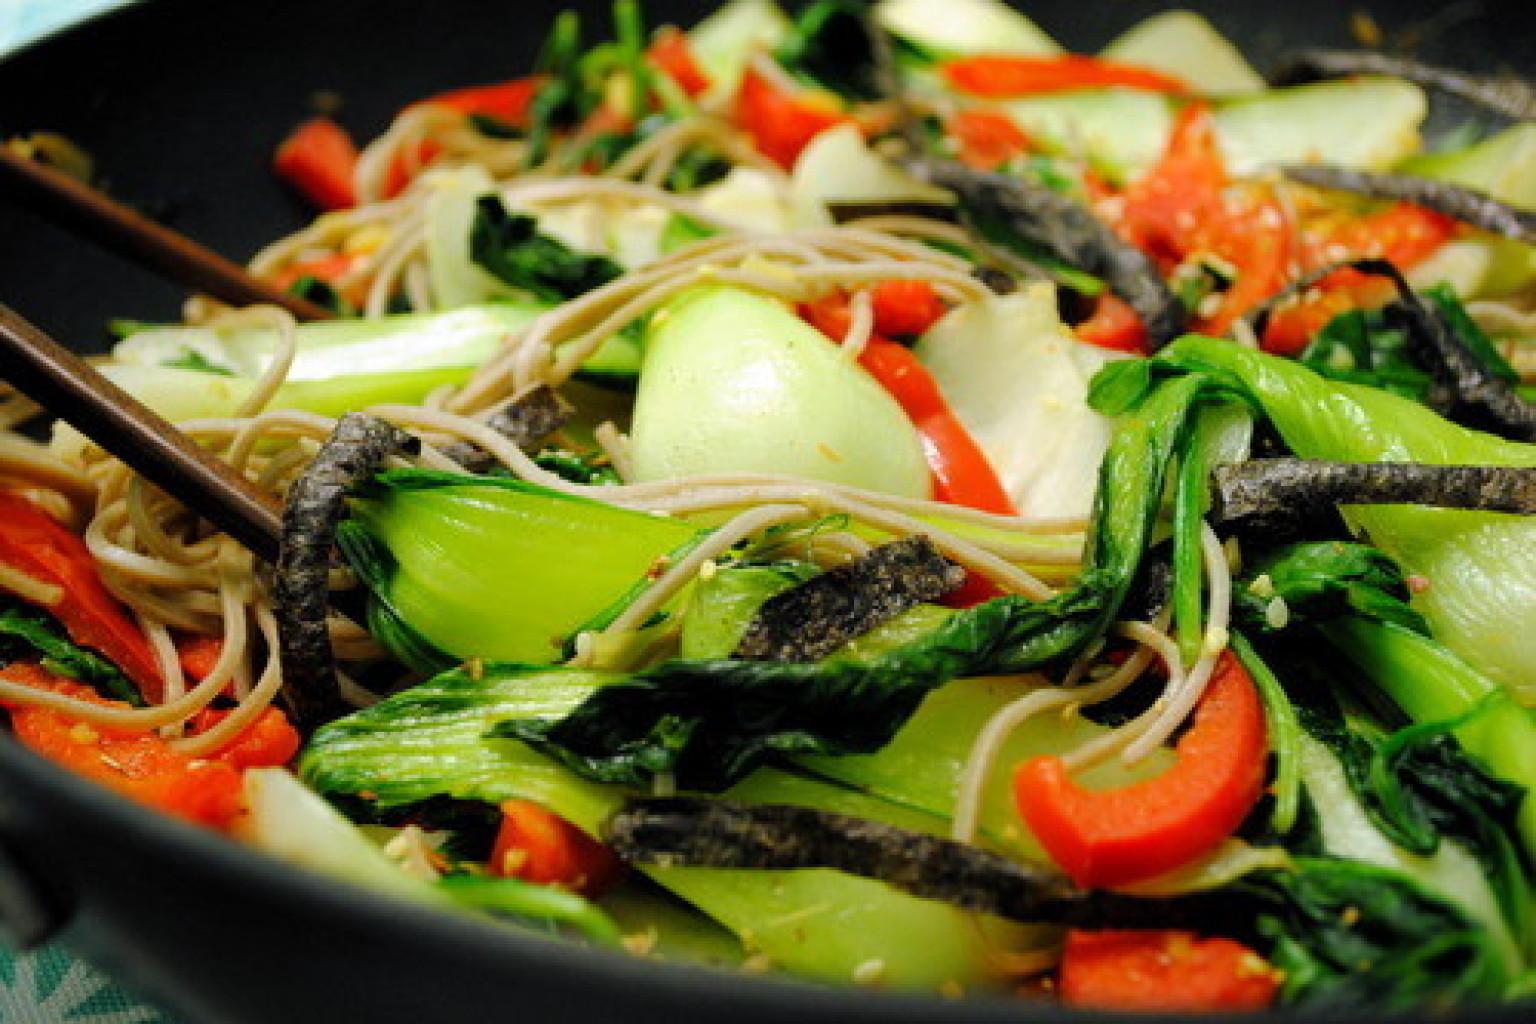 Bok choy recipes a taste of china photos